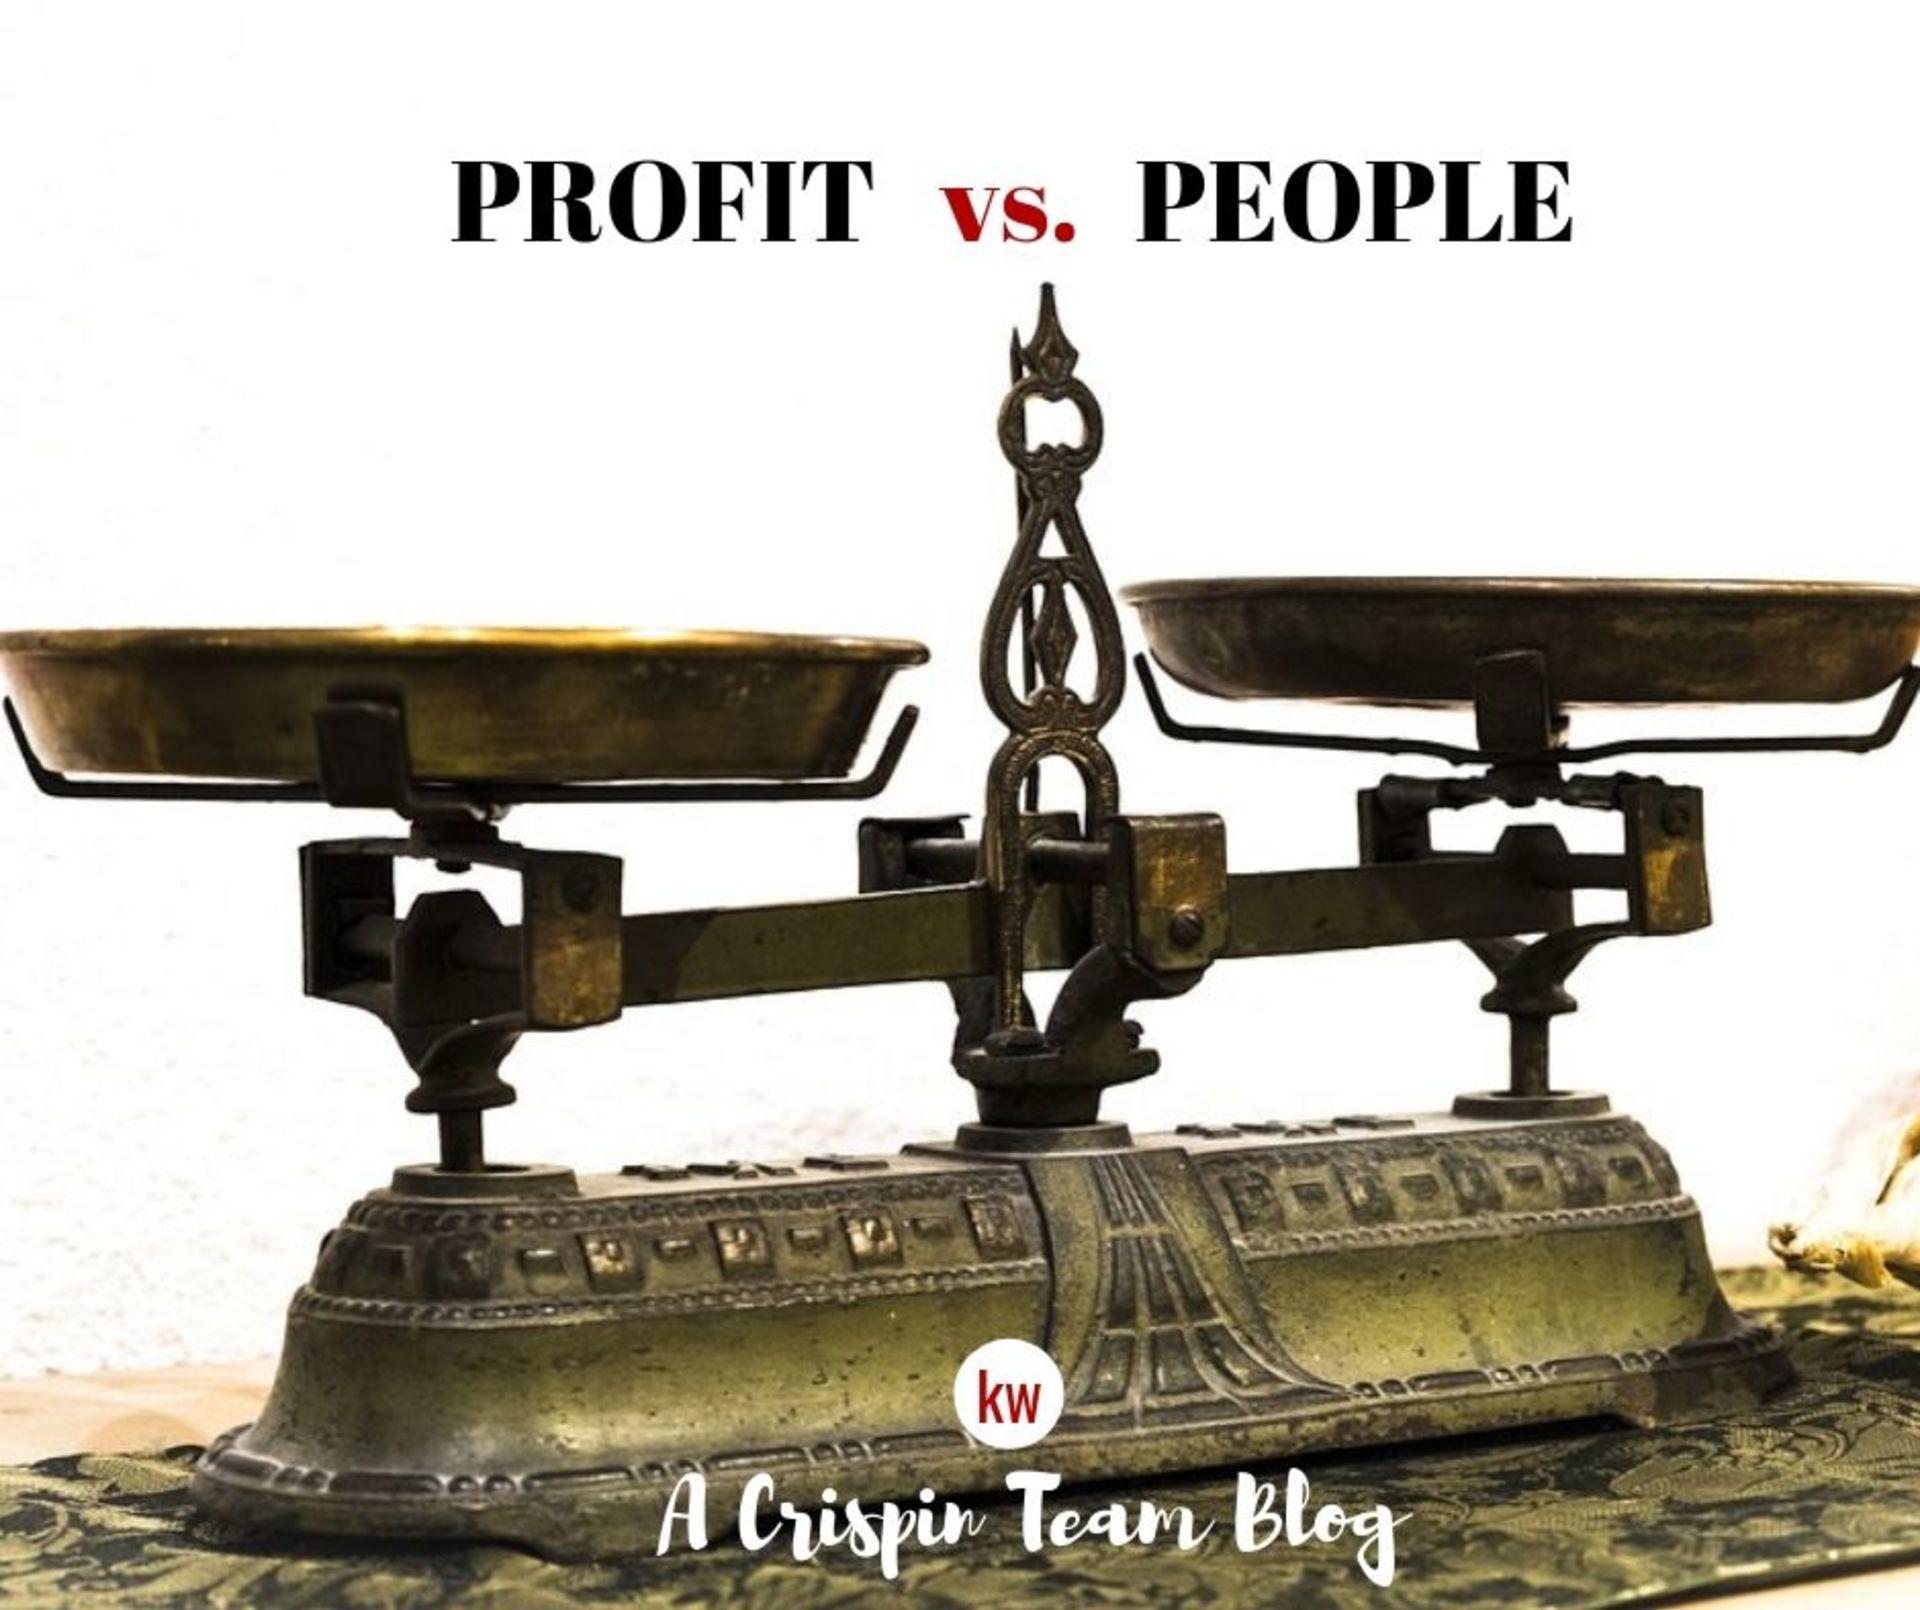 Serving People vs. Serving Money